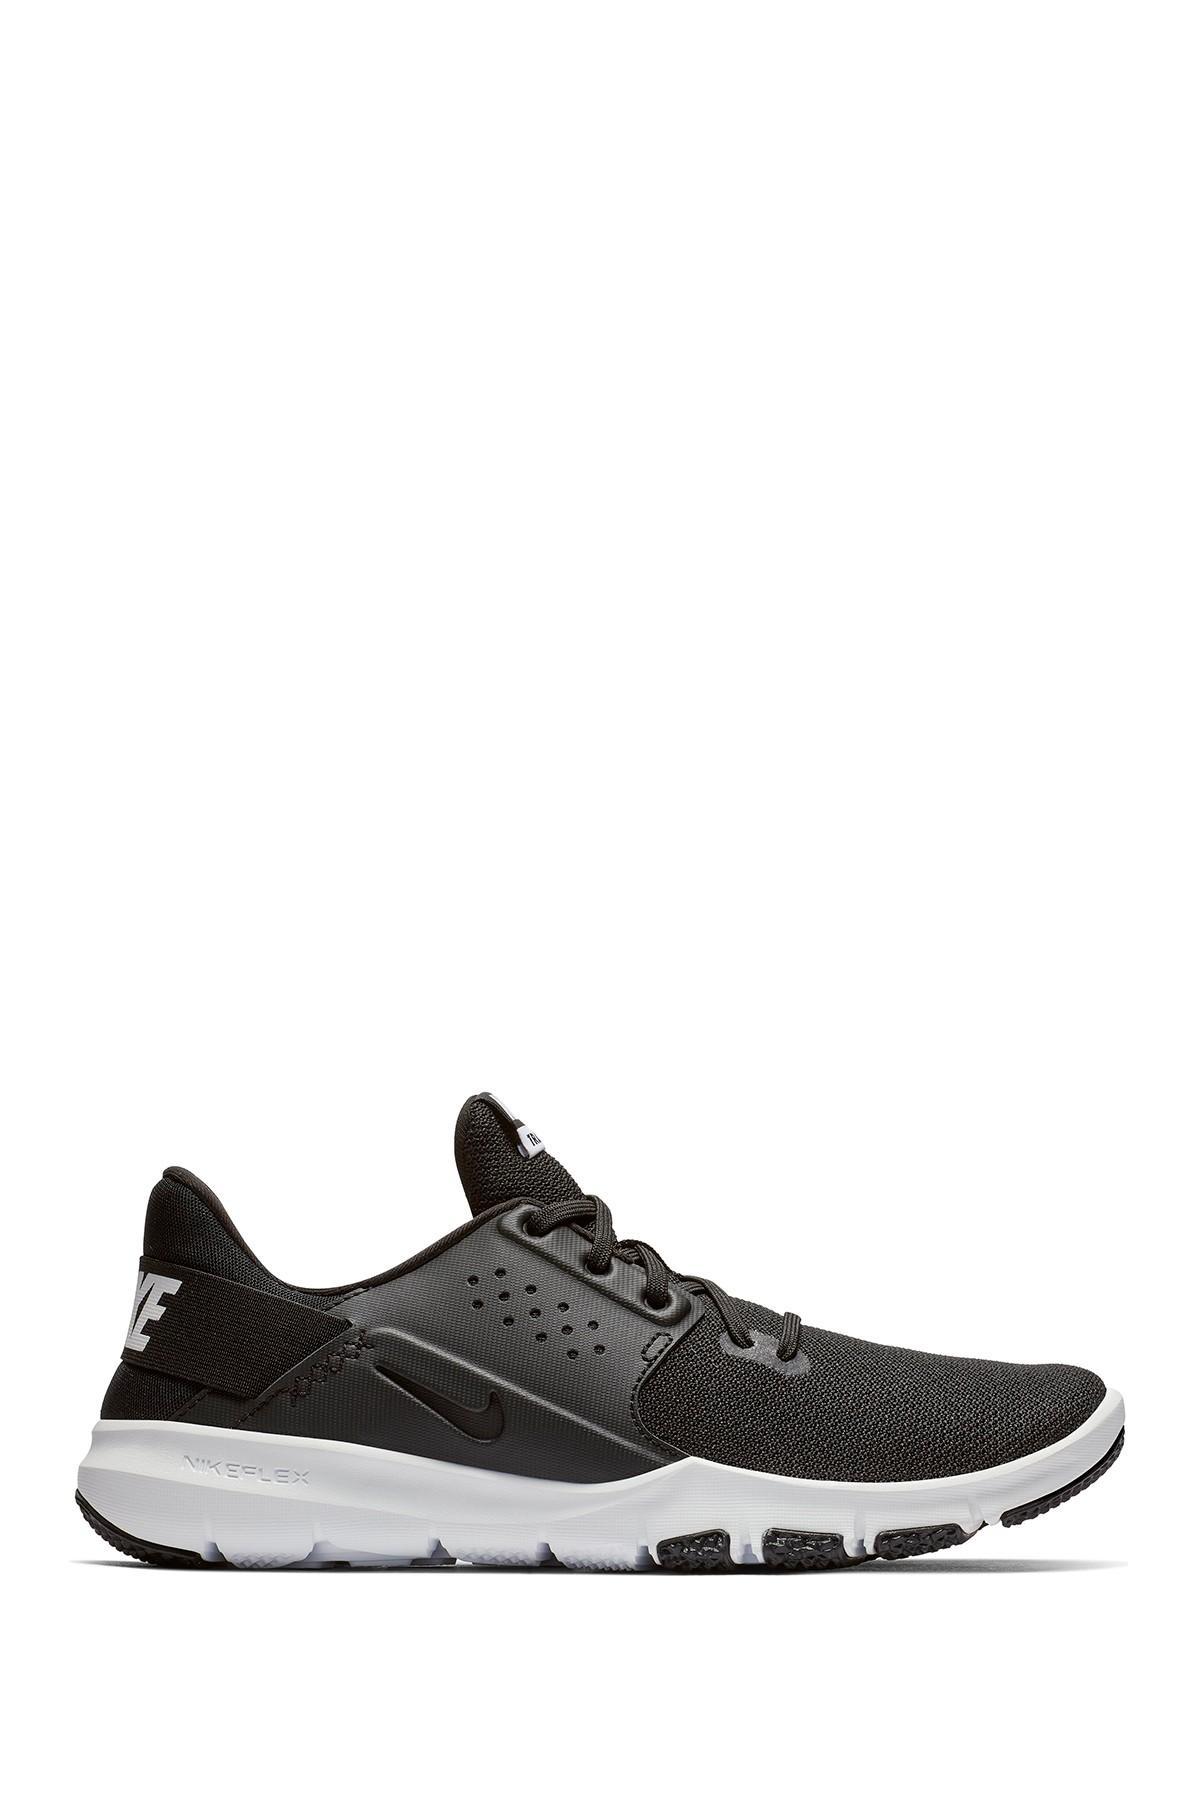 af3f6a06bbe52 Nike Flex Control 3 Training Shoe in Black for Men - Lyst